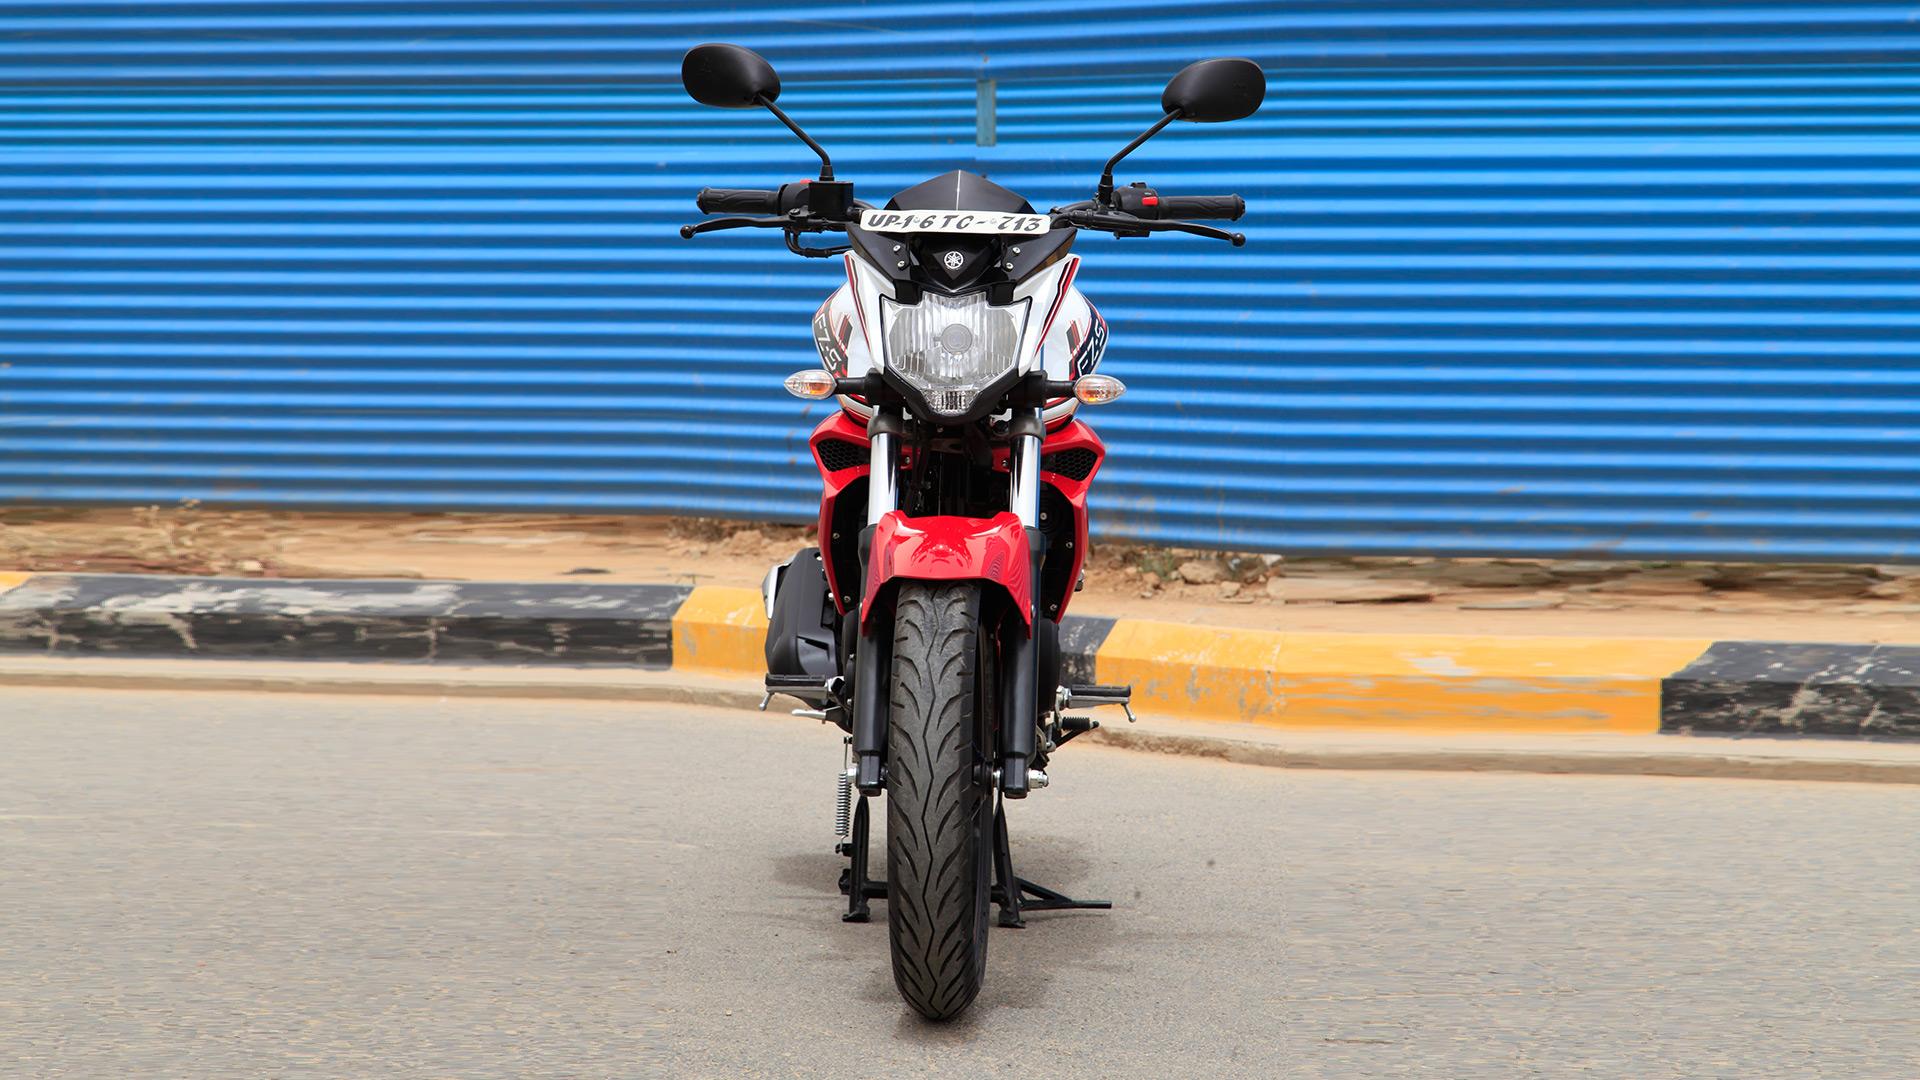 Yamaha FZ 2014 S Version 2.0 Compare